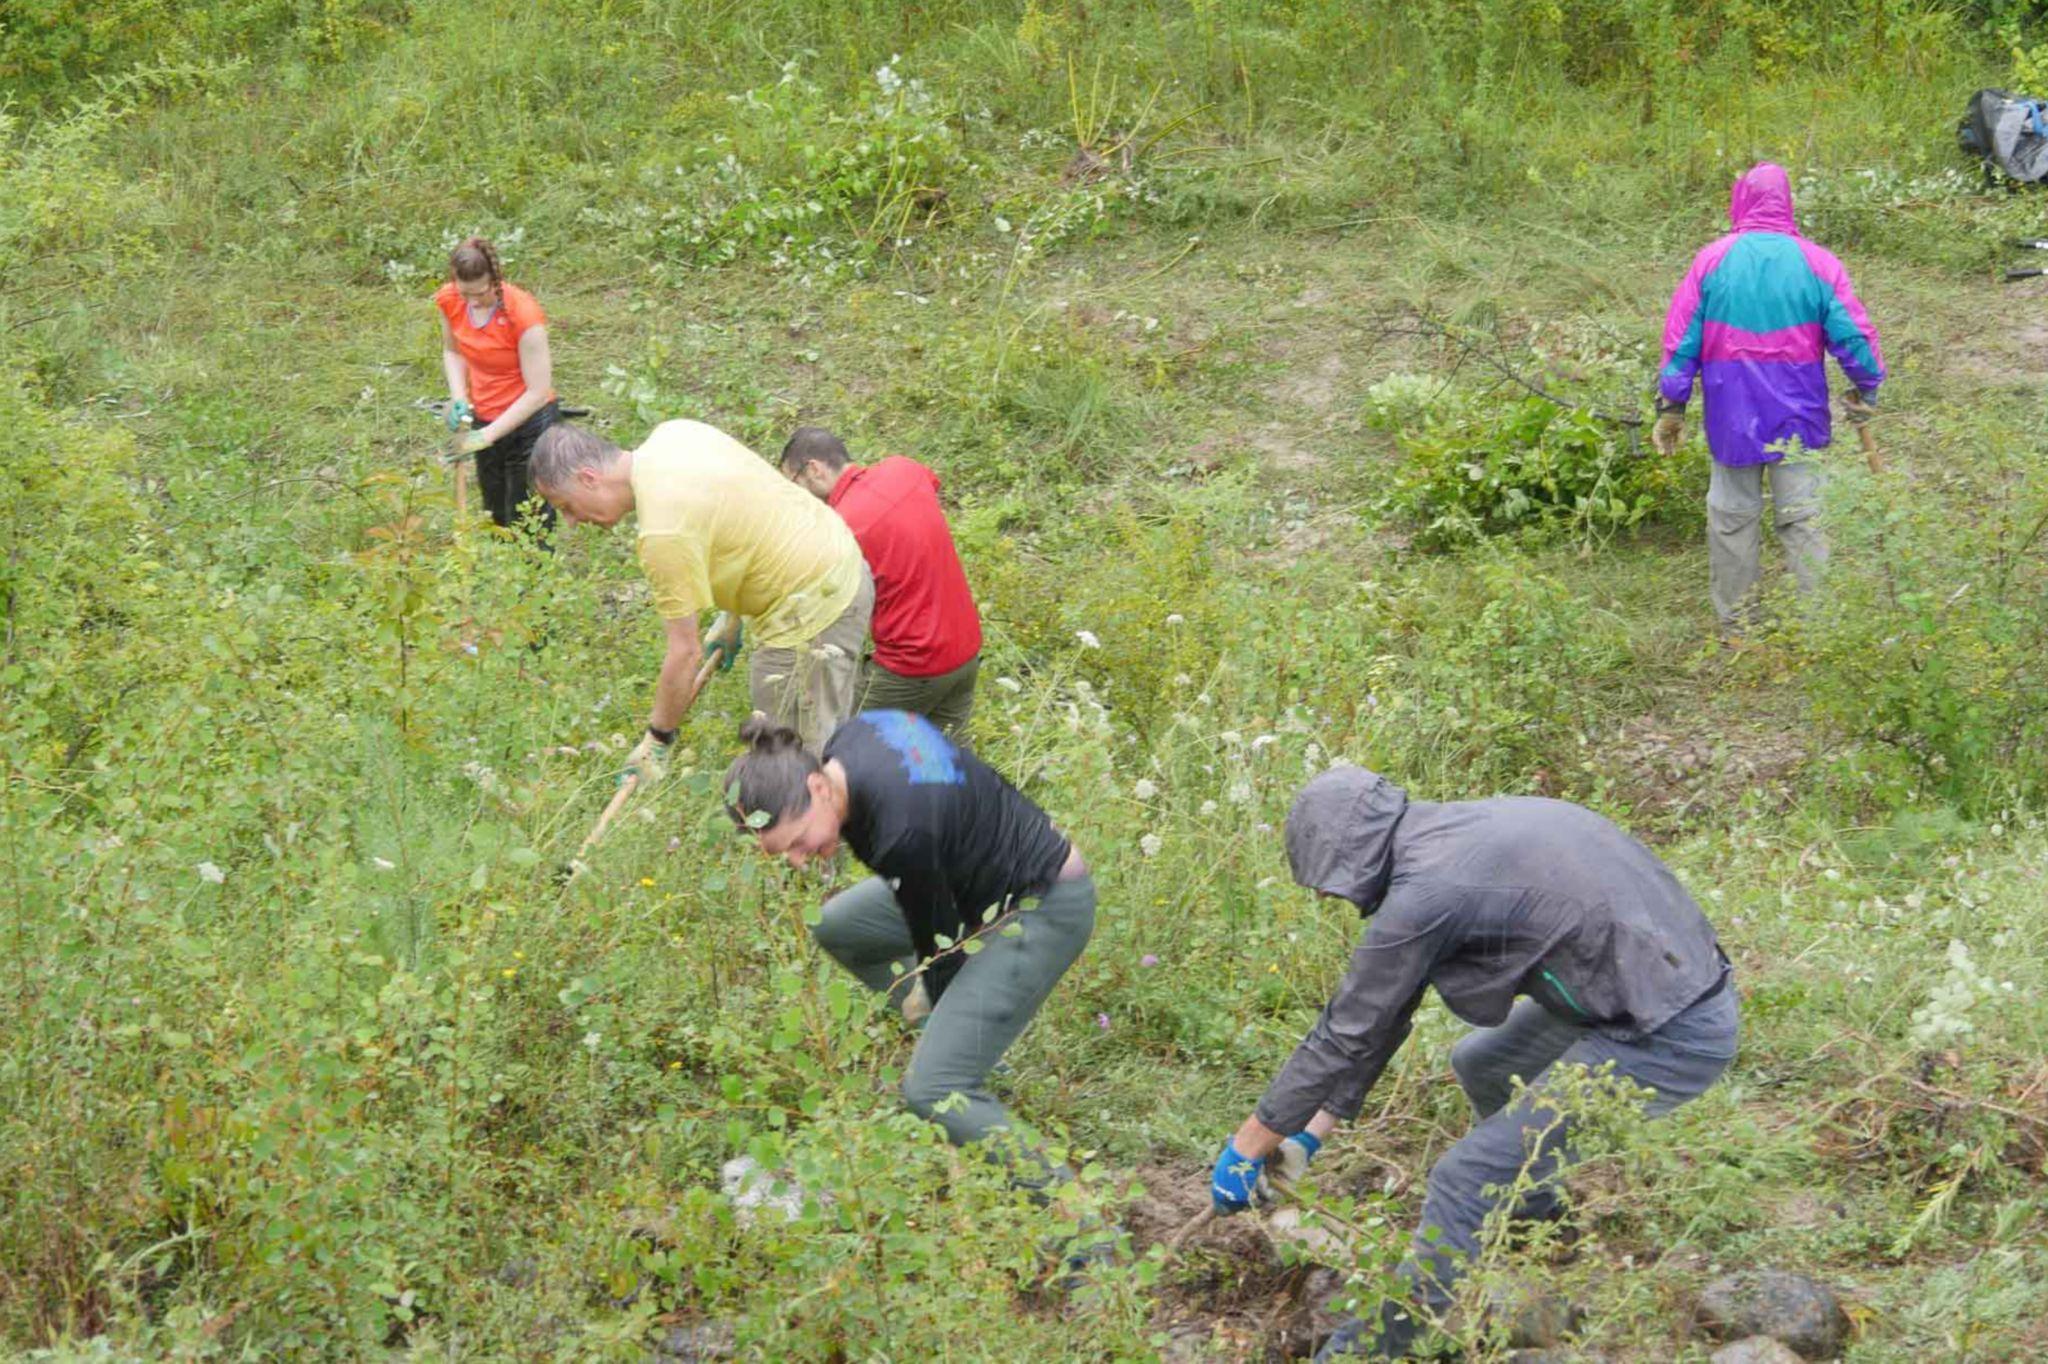 Group of People Gardening